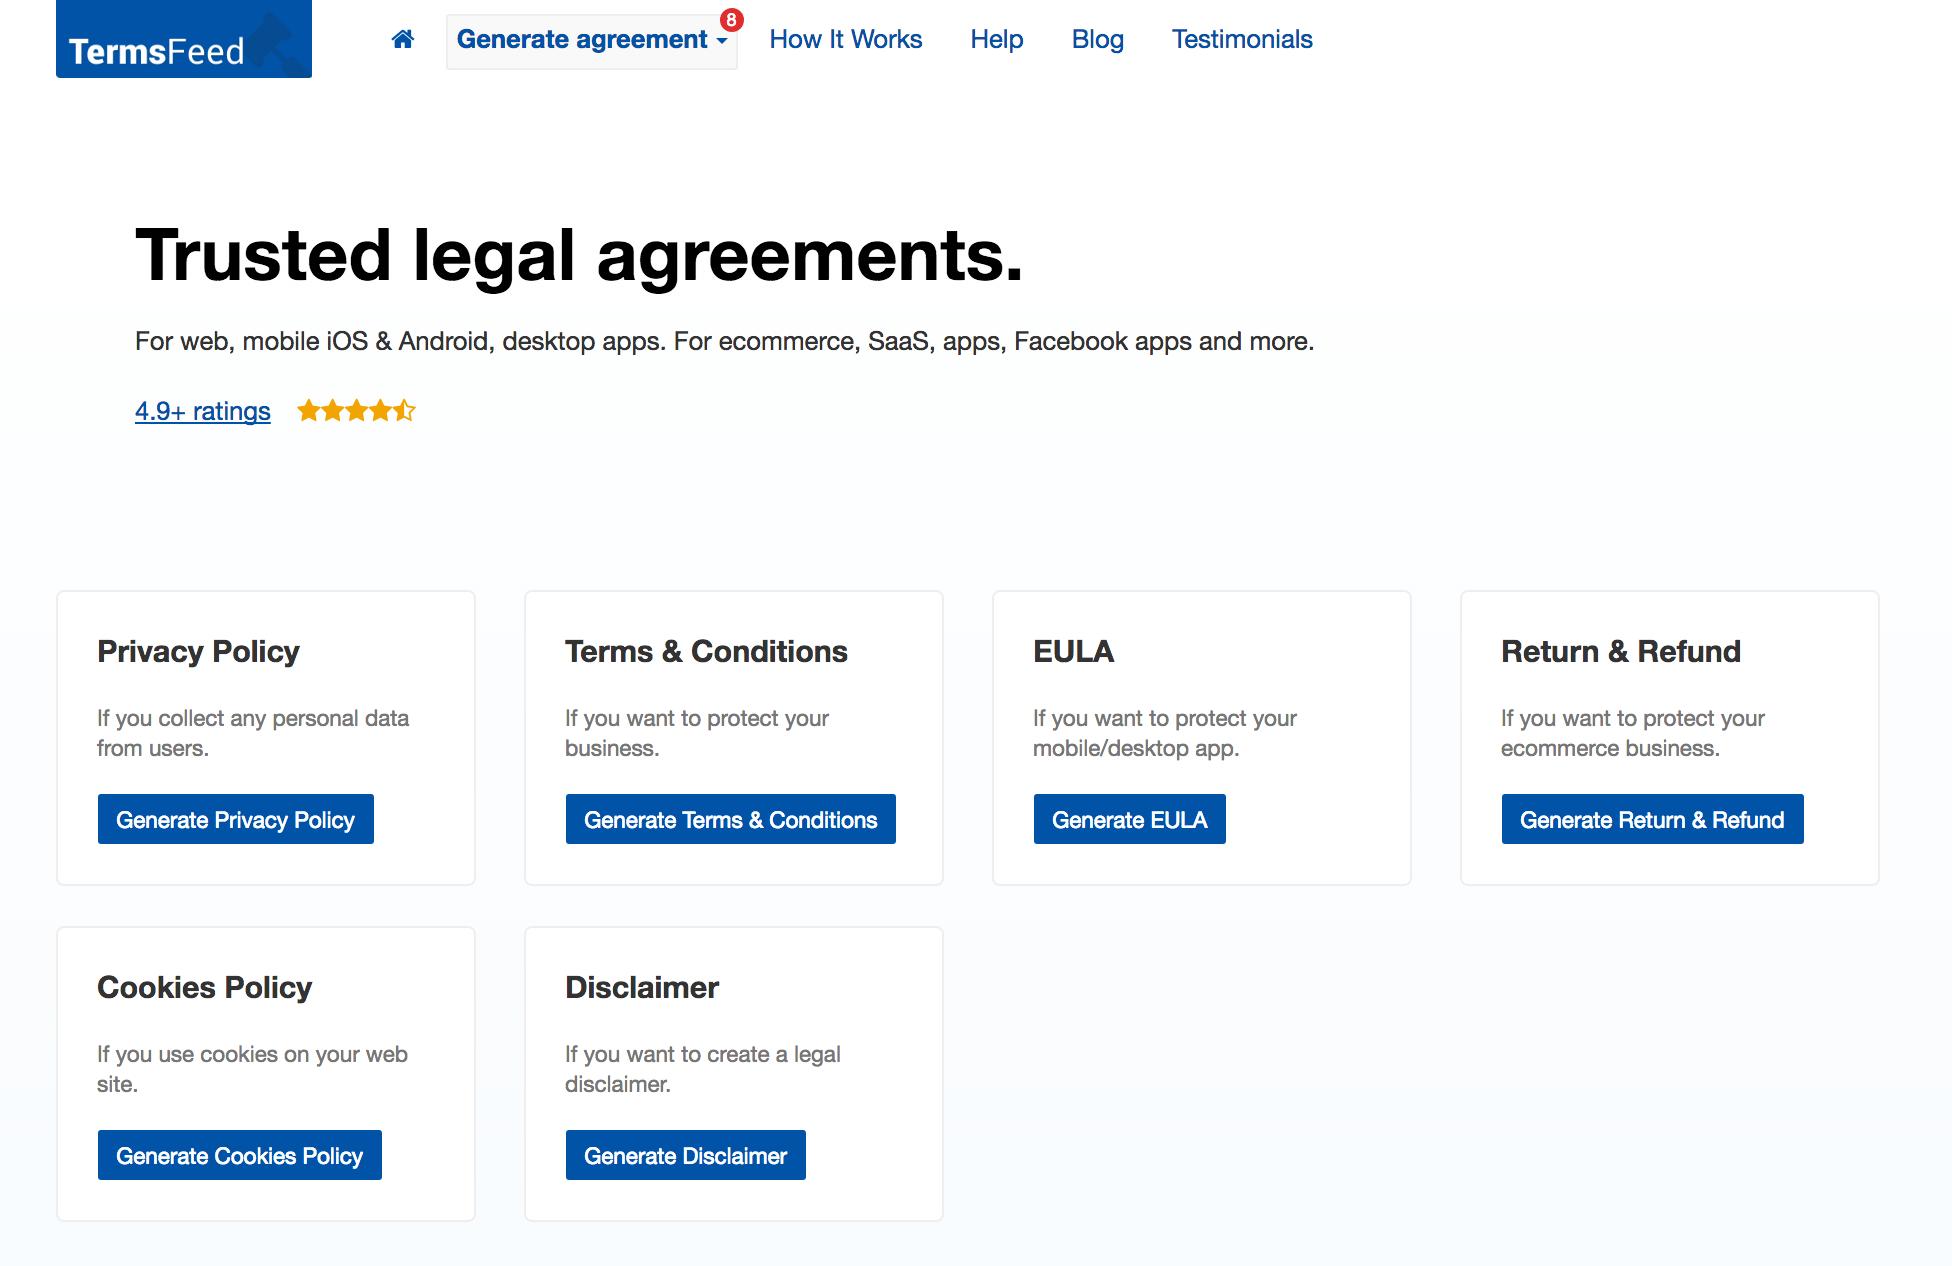 Homepage of TermsFeed